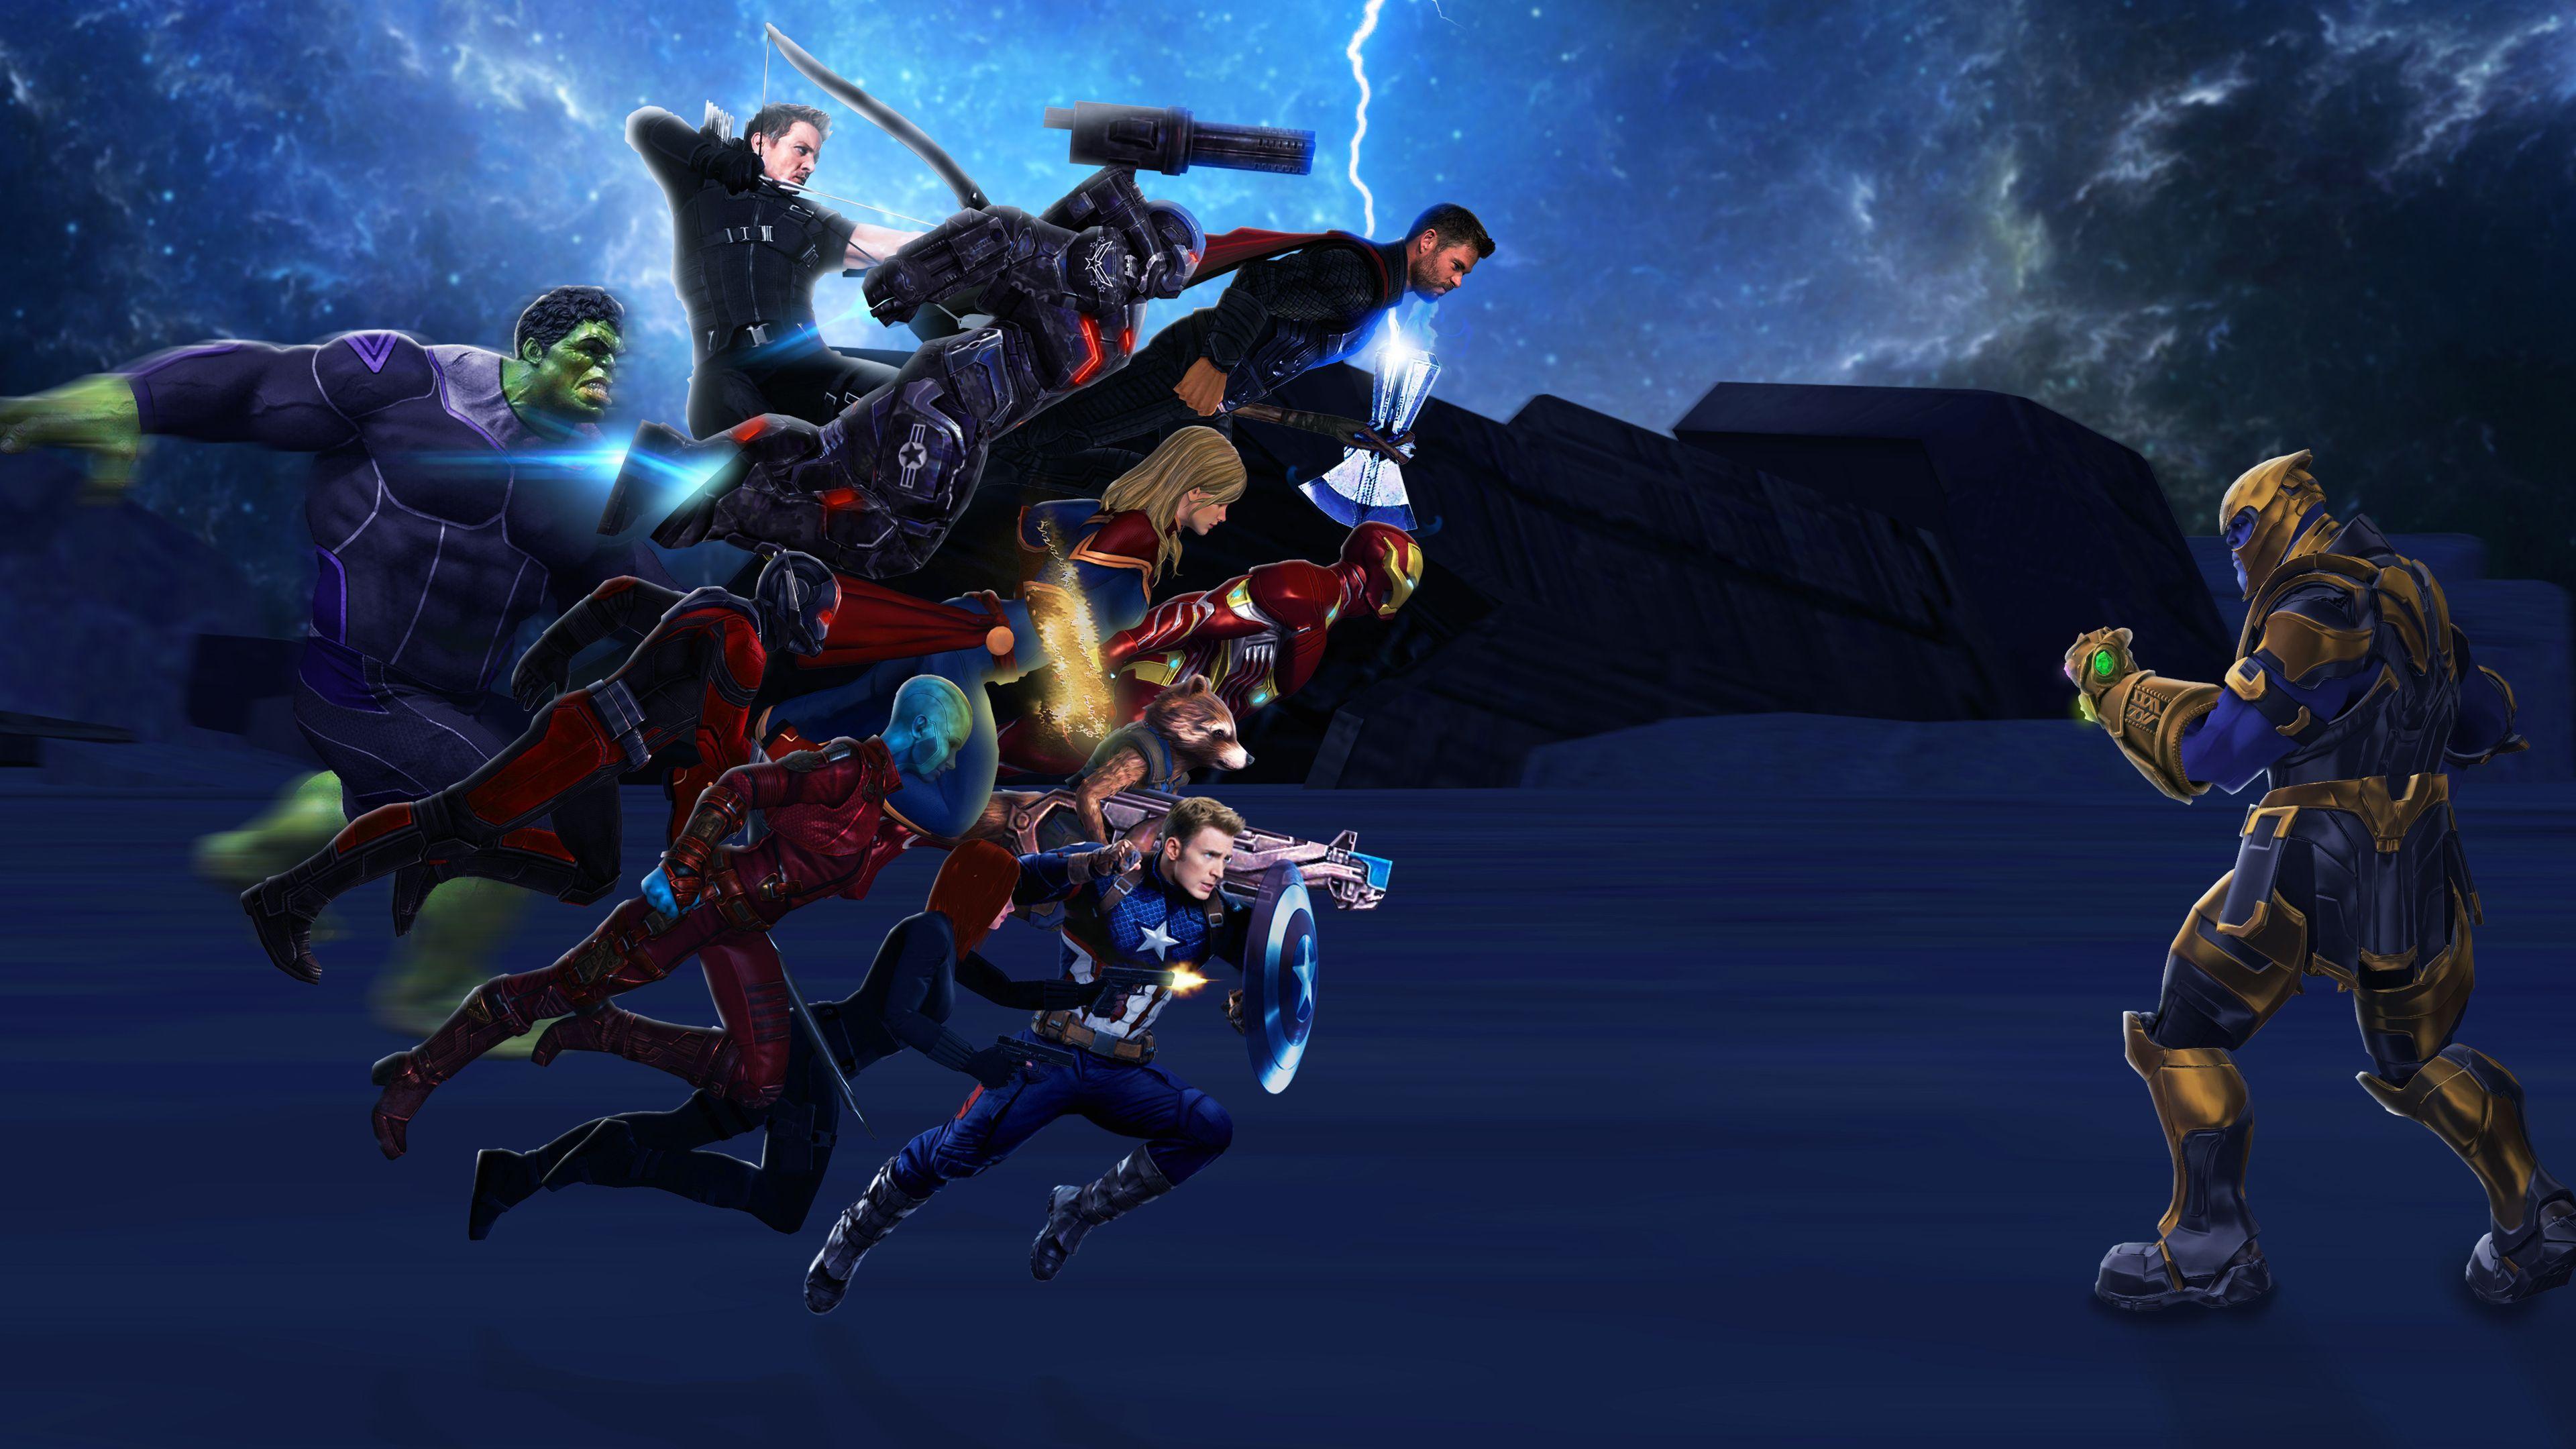 Avengers Endgame 4k Art Superheroes Wallpapers Movies Art